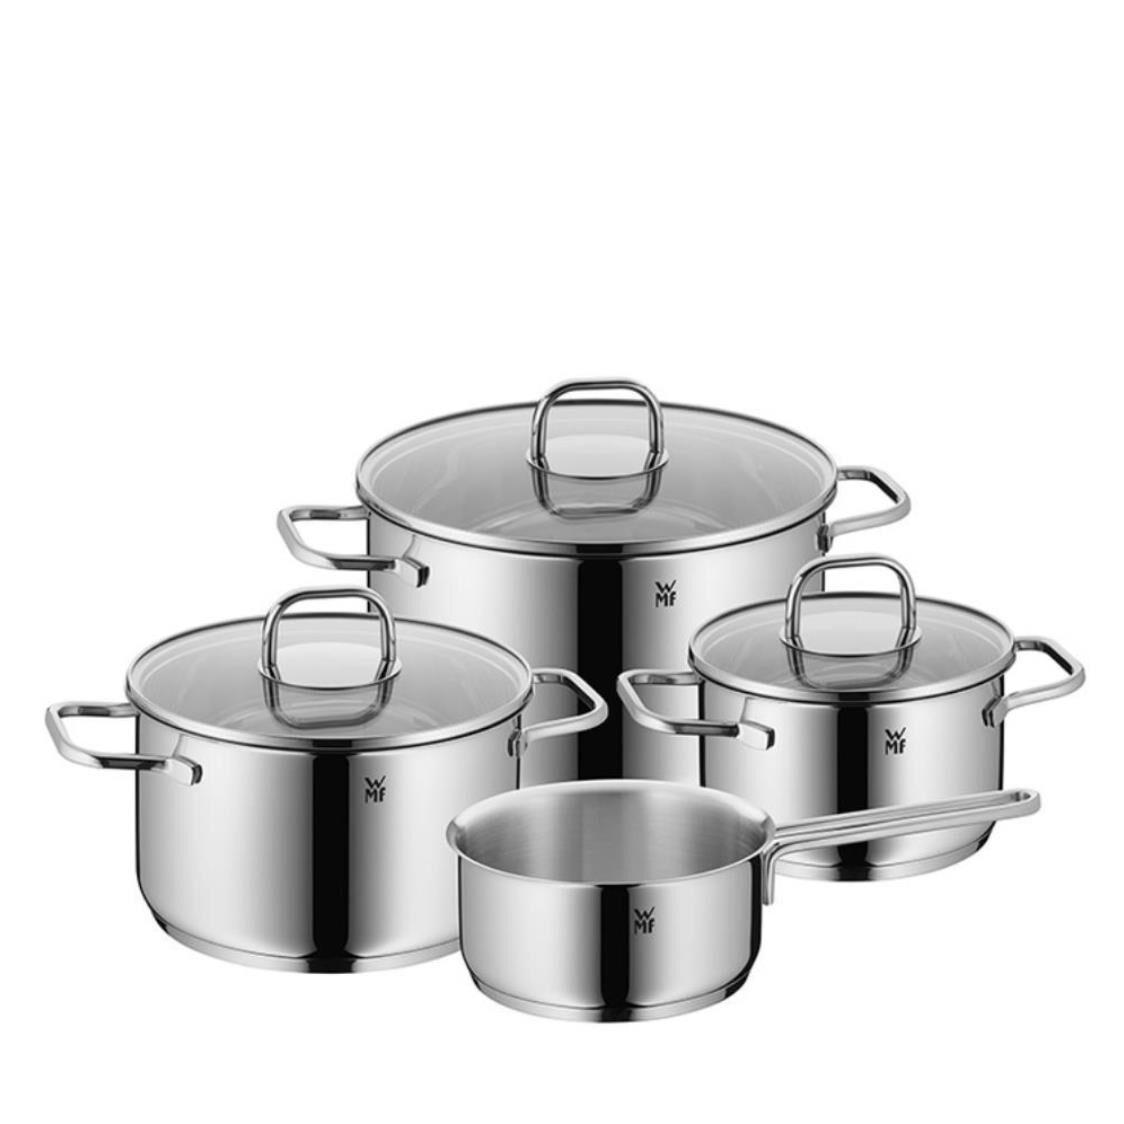 WMF Inspiration 4pc Cookware Set